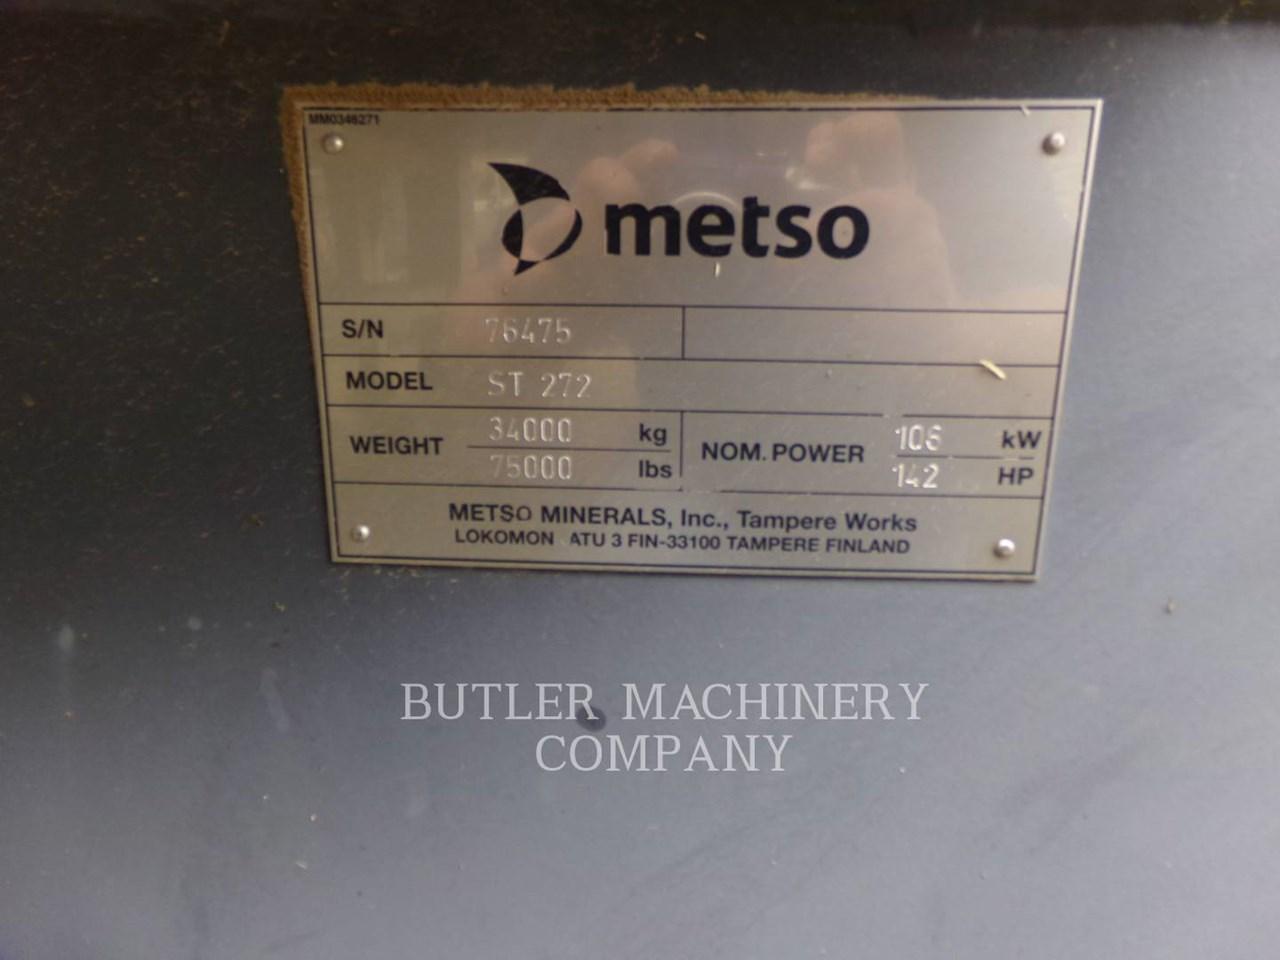 2011 Metso ST272 Image 6